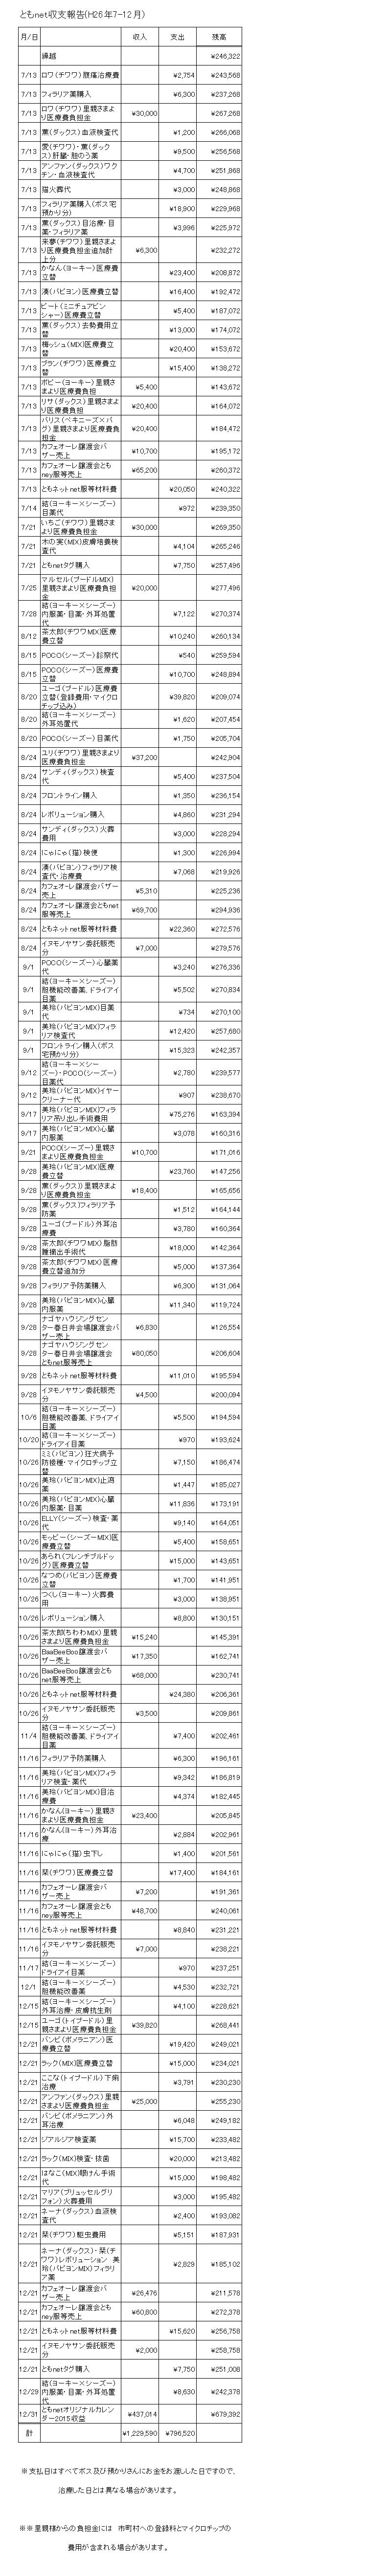 収支報告7-12